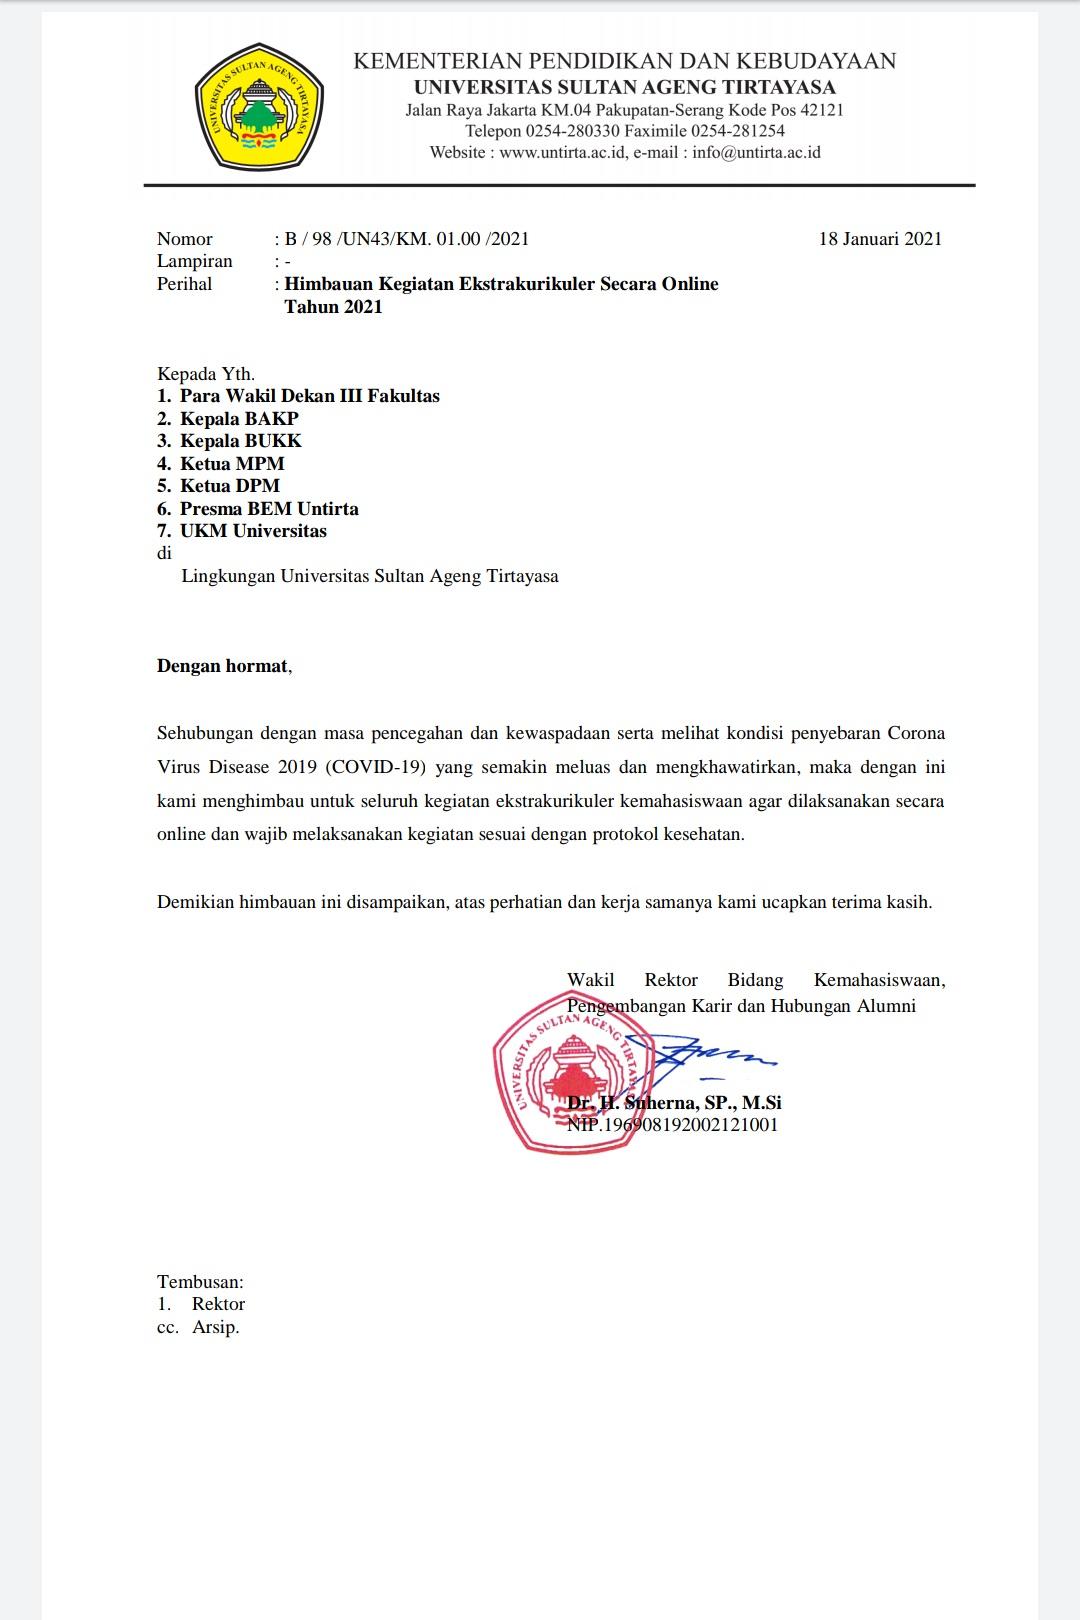 Surat imbauan Untirta